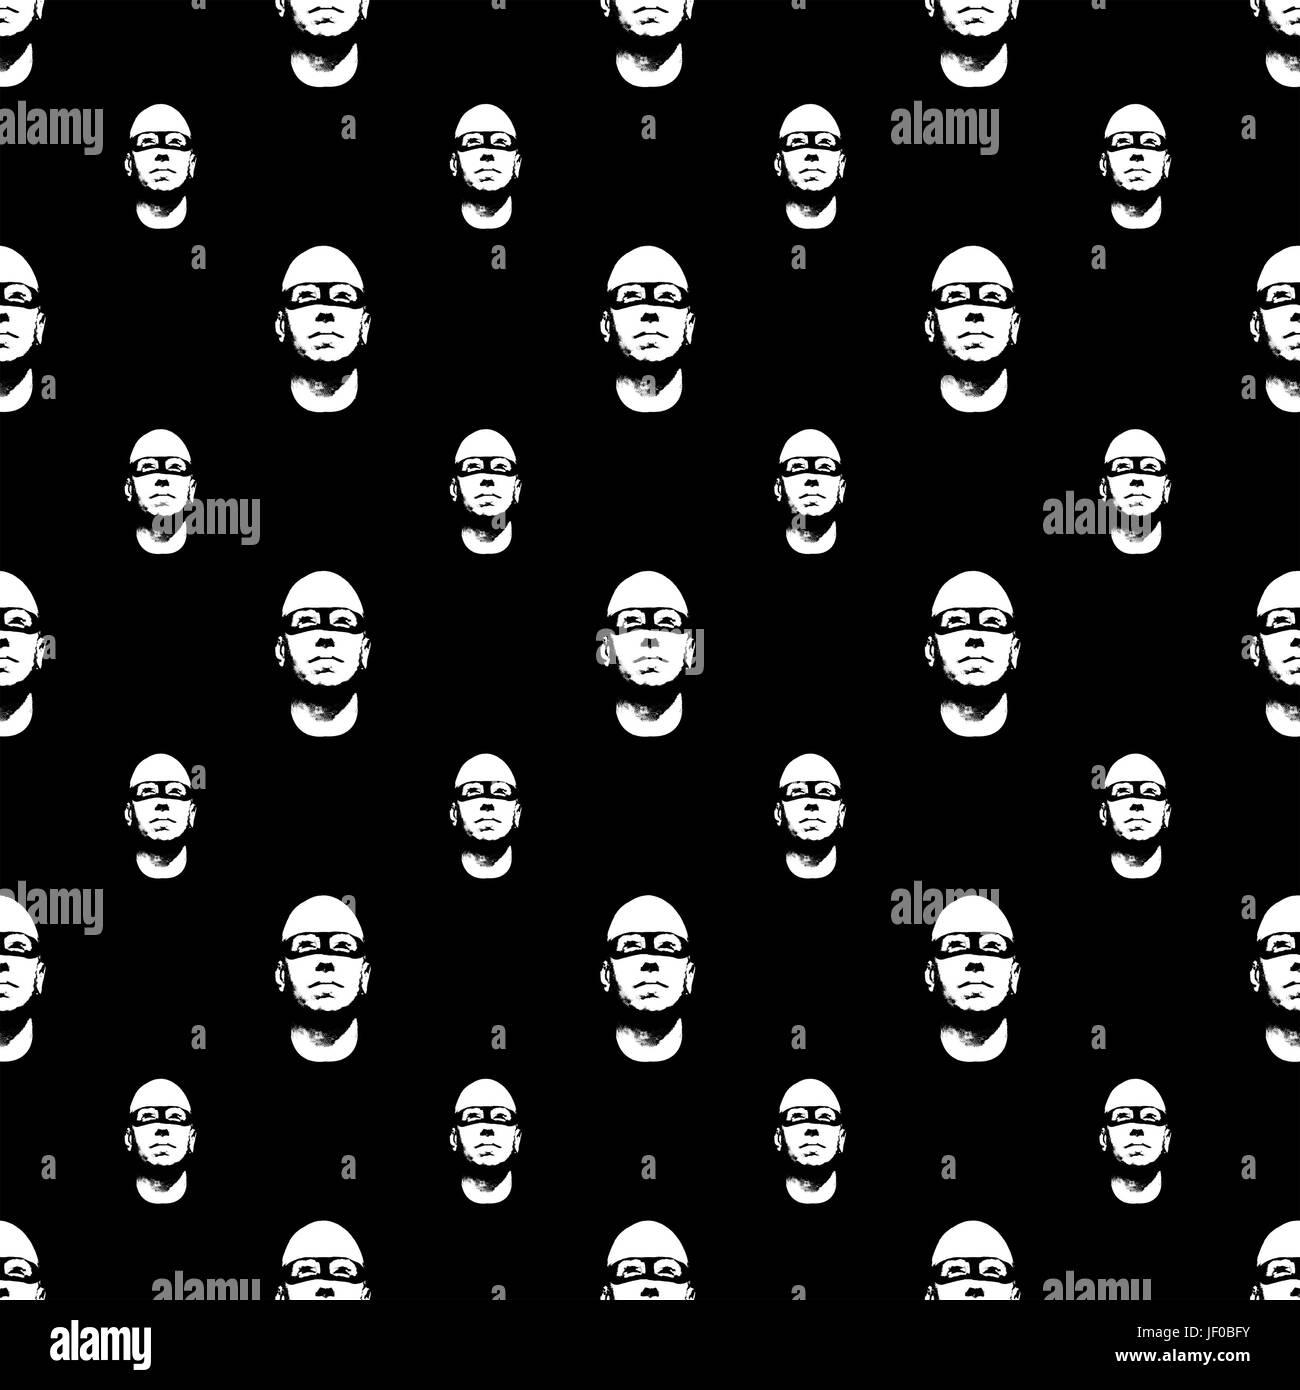 Baldhead Hero Comic Pattern - Stock Image